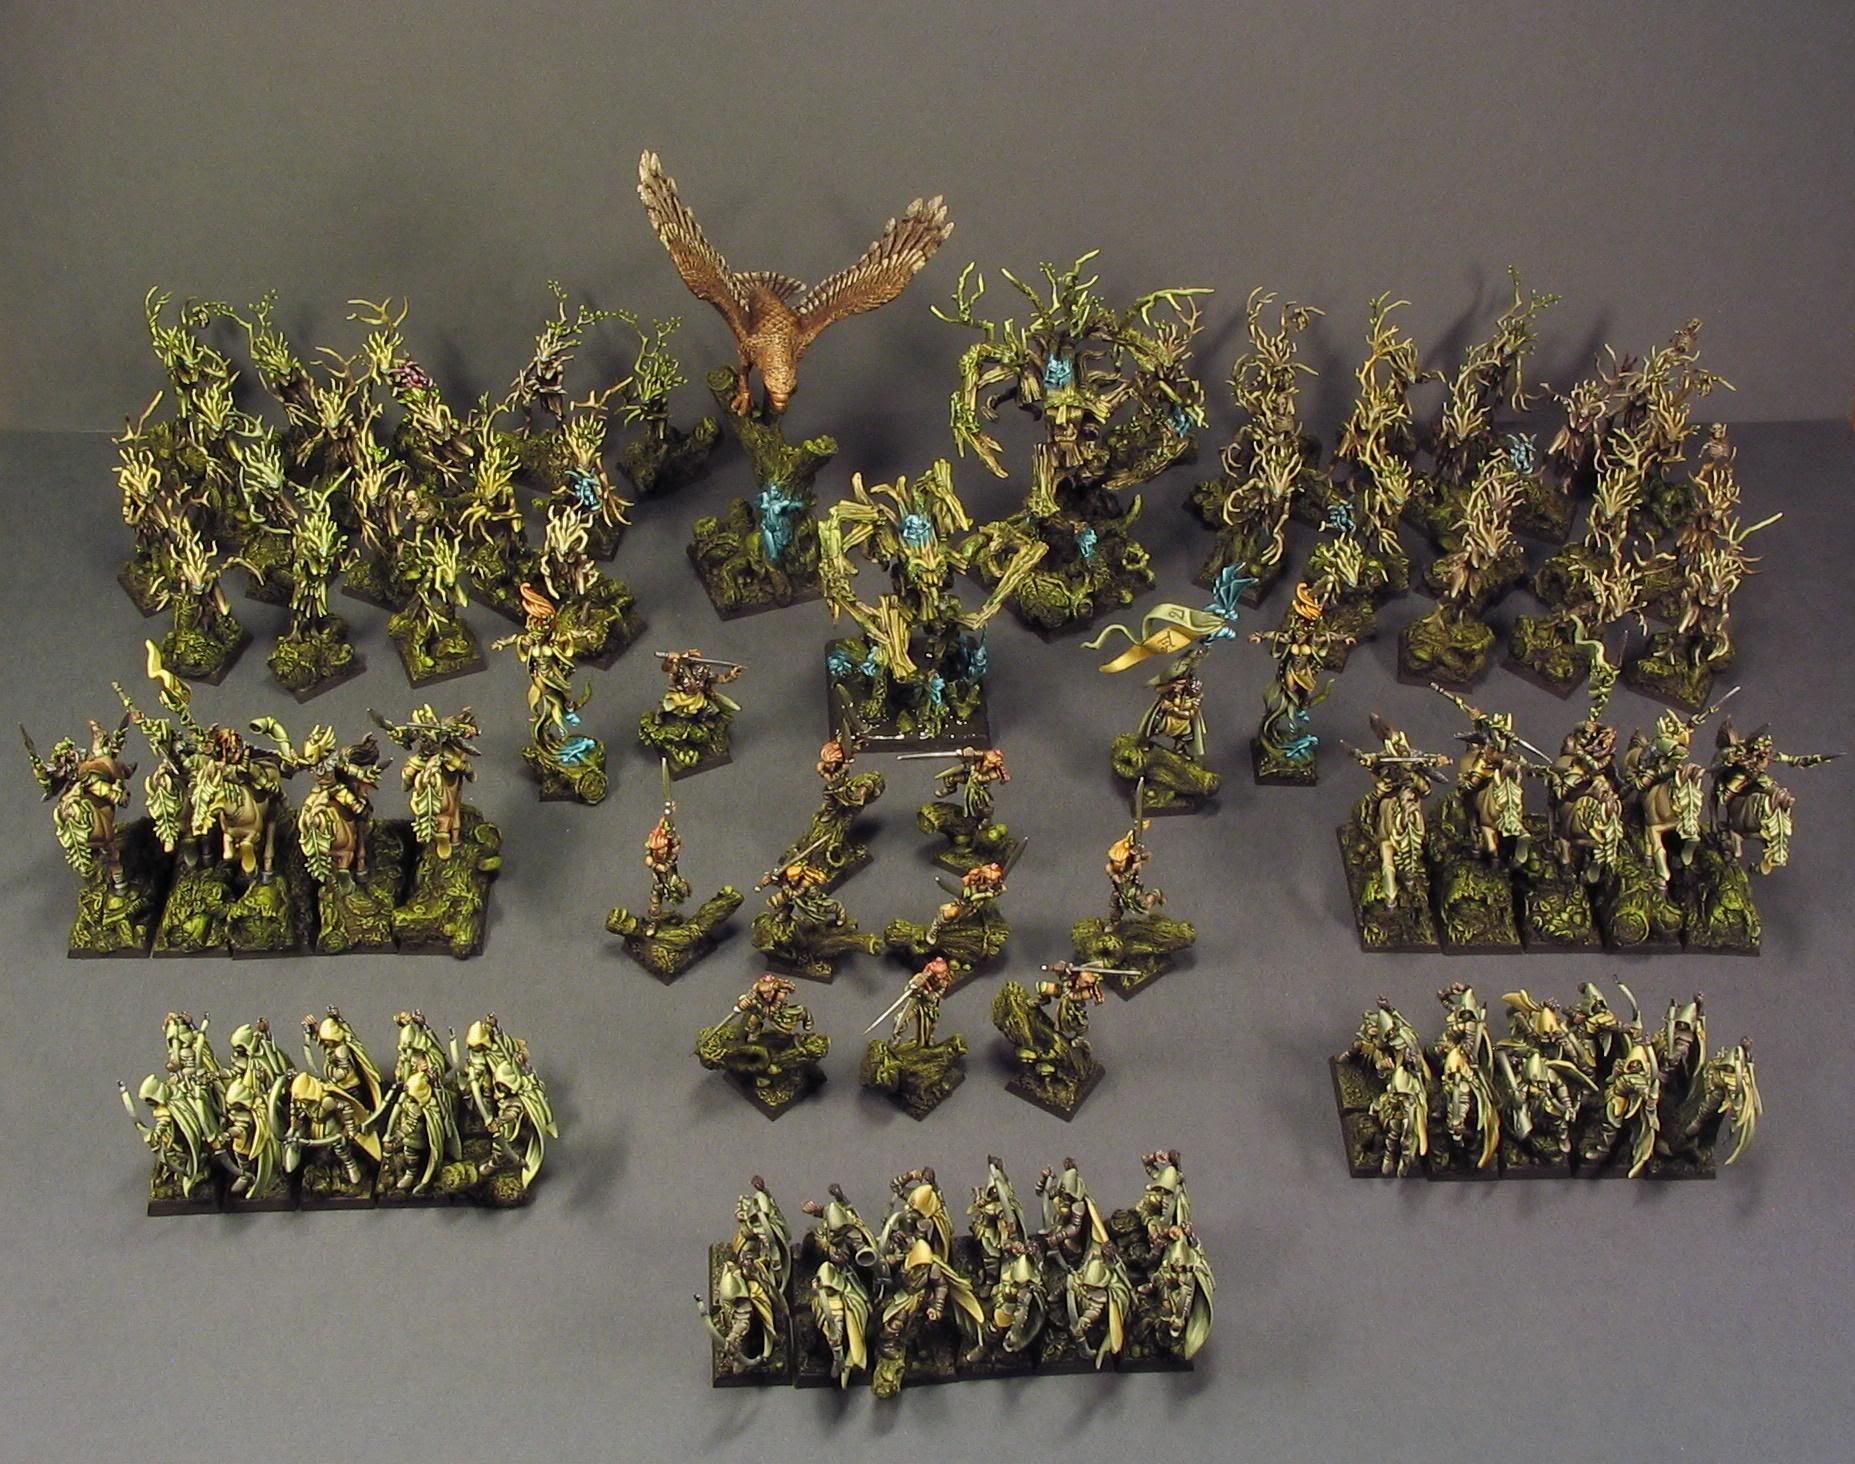 Silver helms - Warhammer / High Elves / Age of Sigmar / Aelfs | My ...